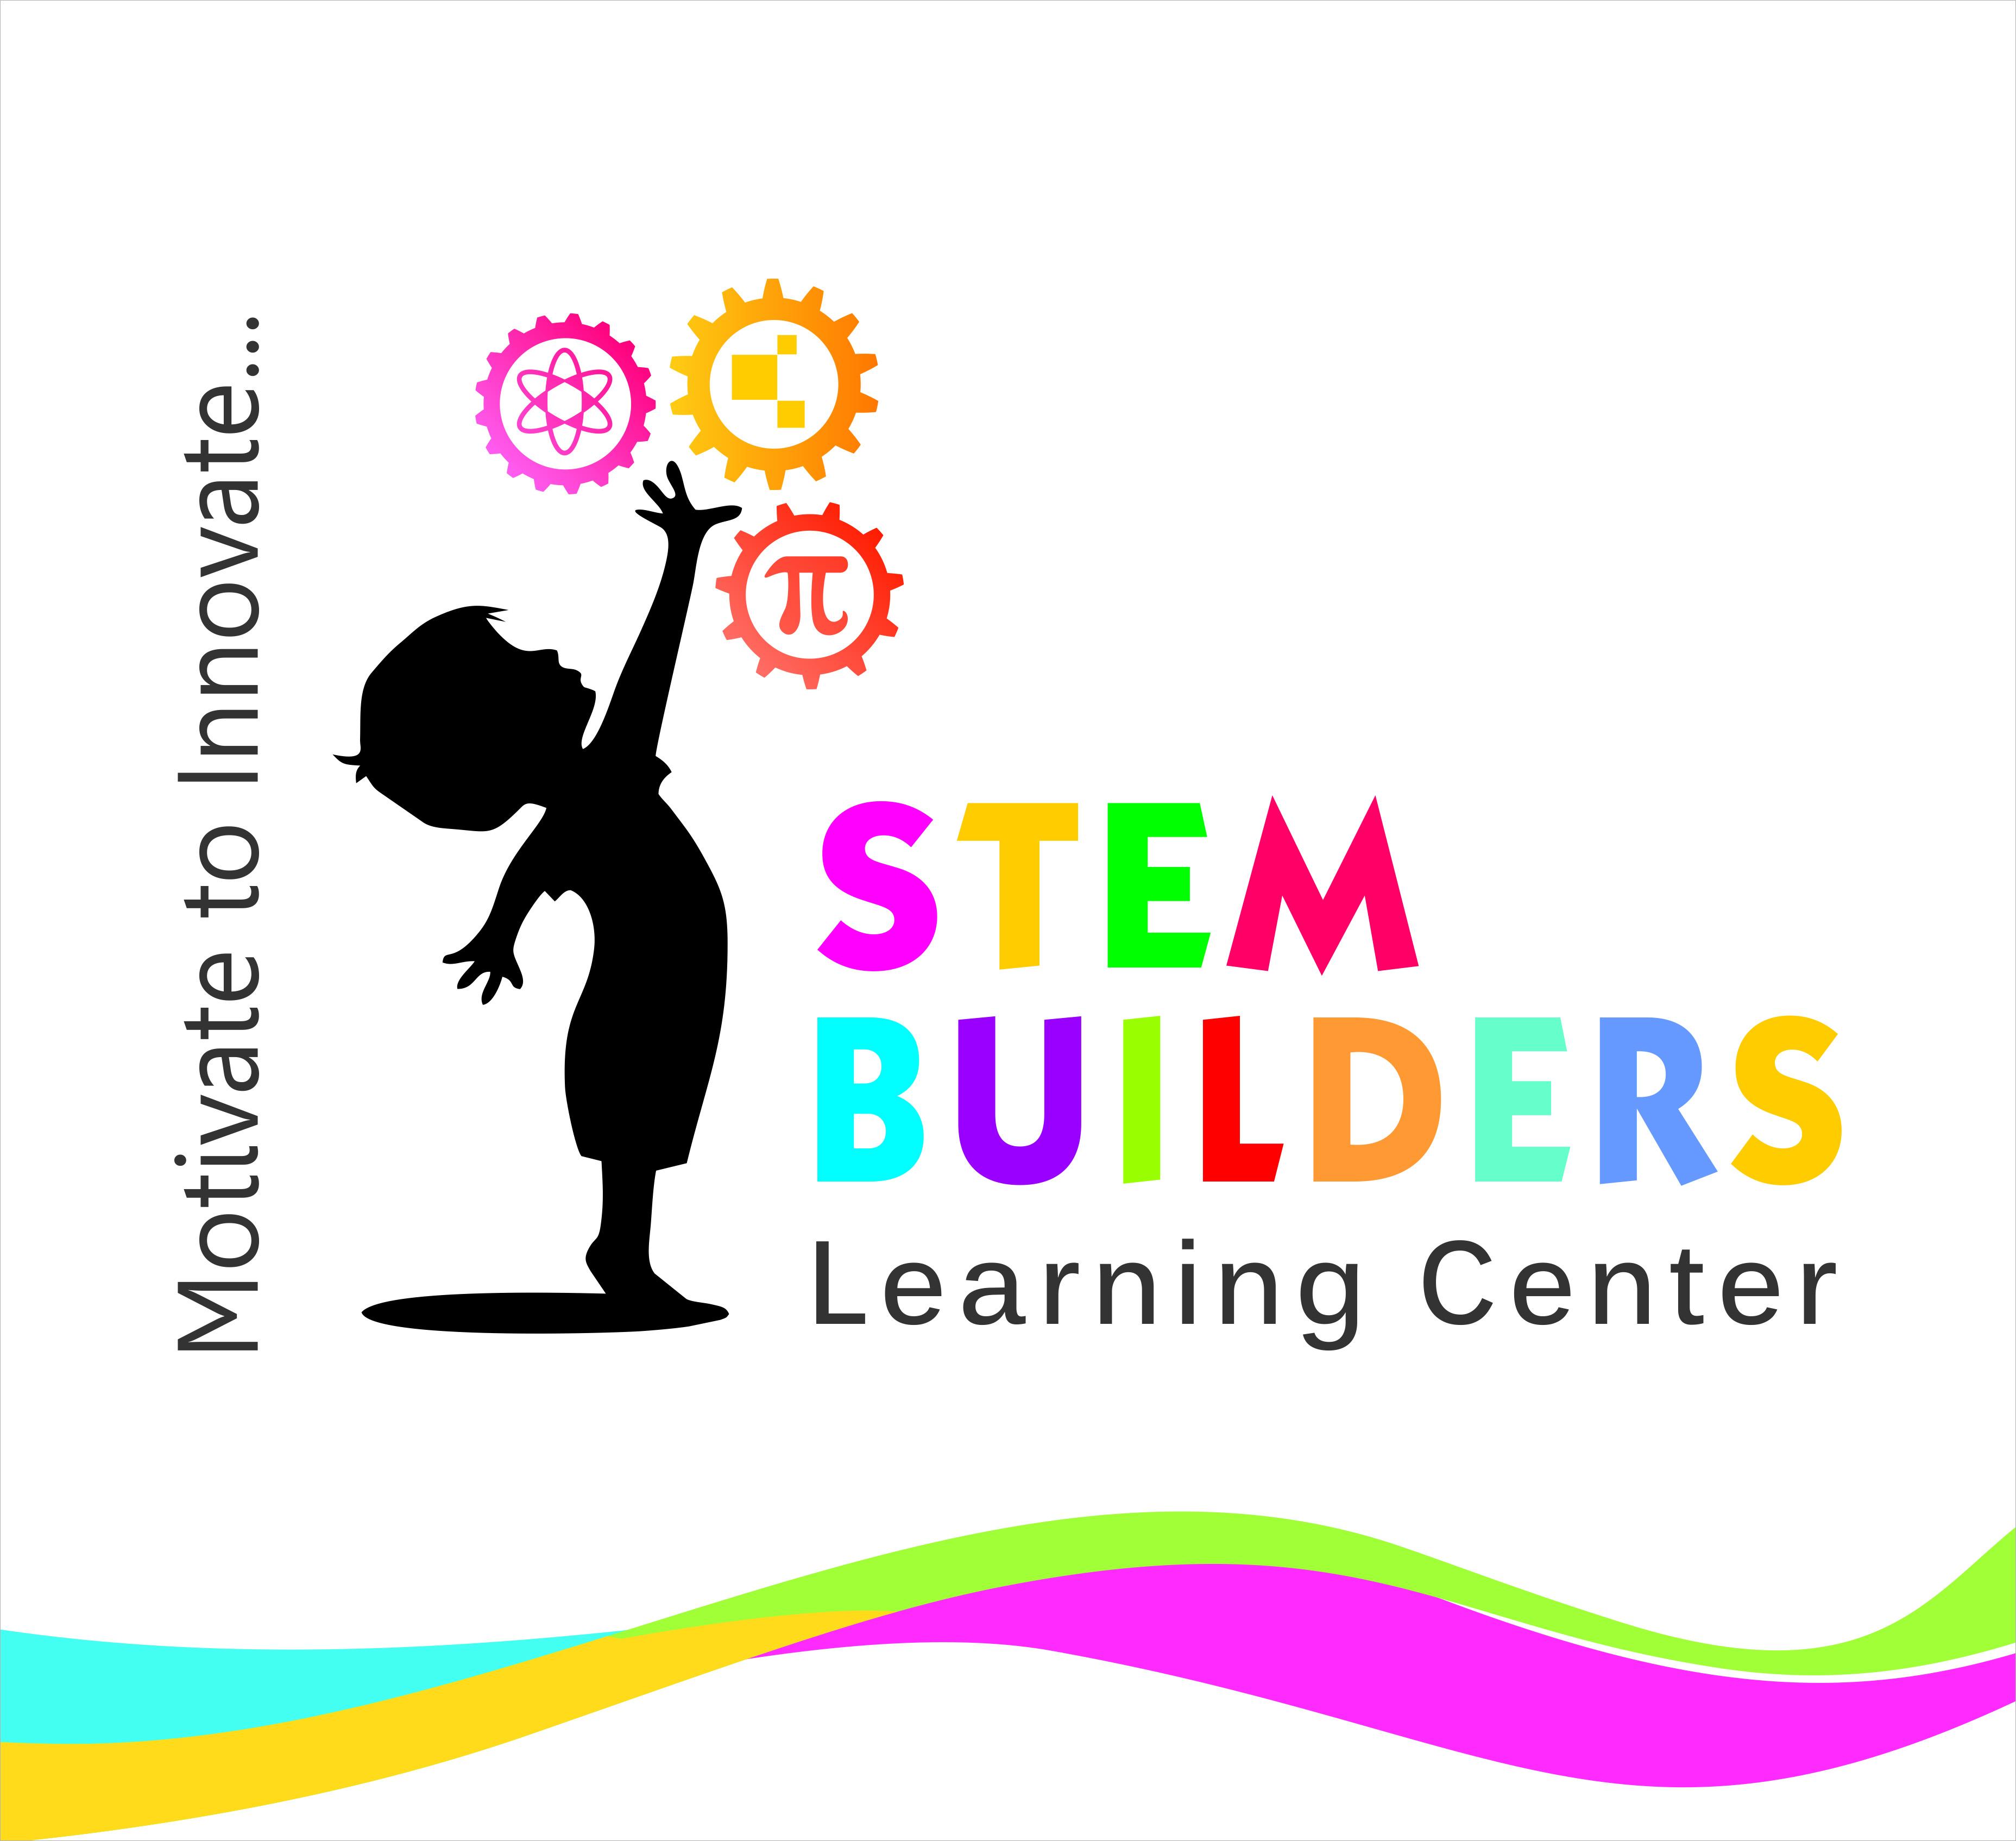 STEM Builders